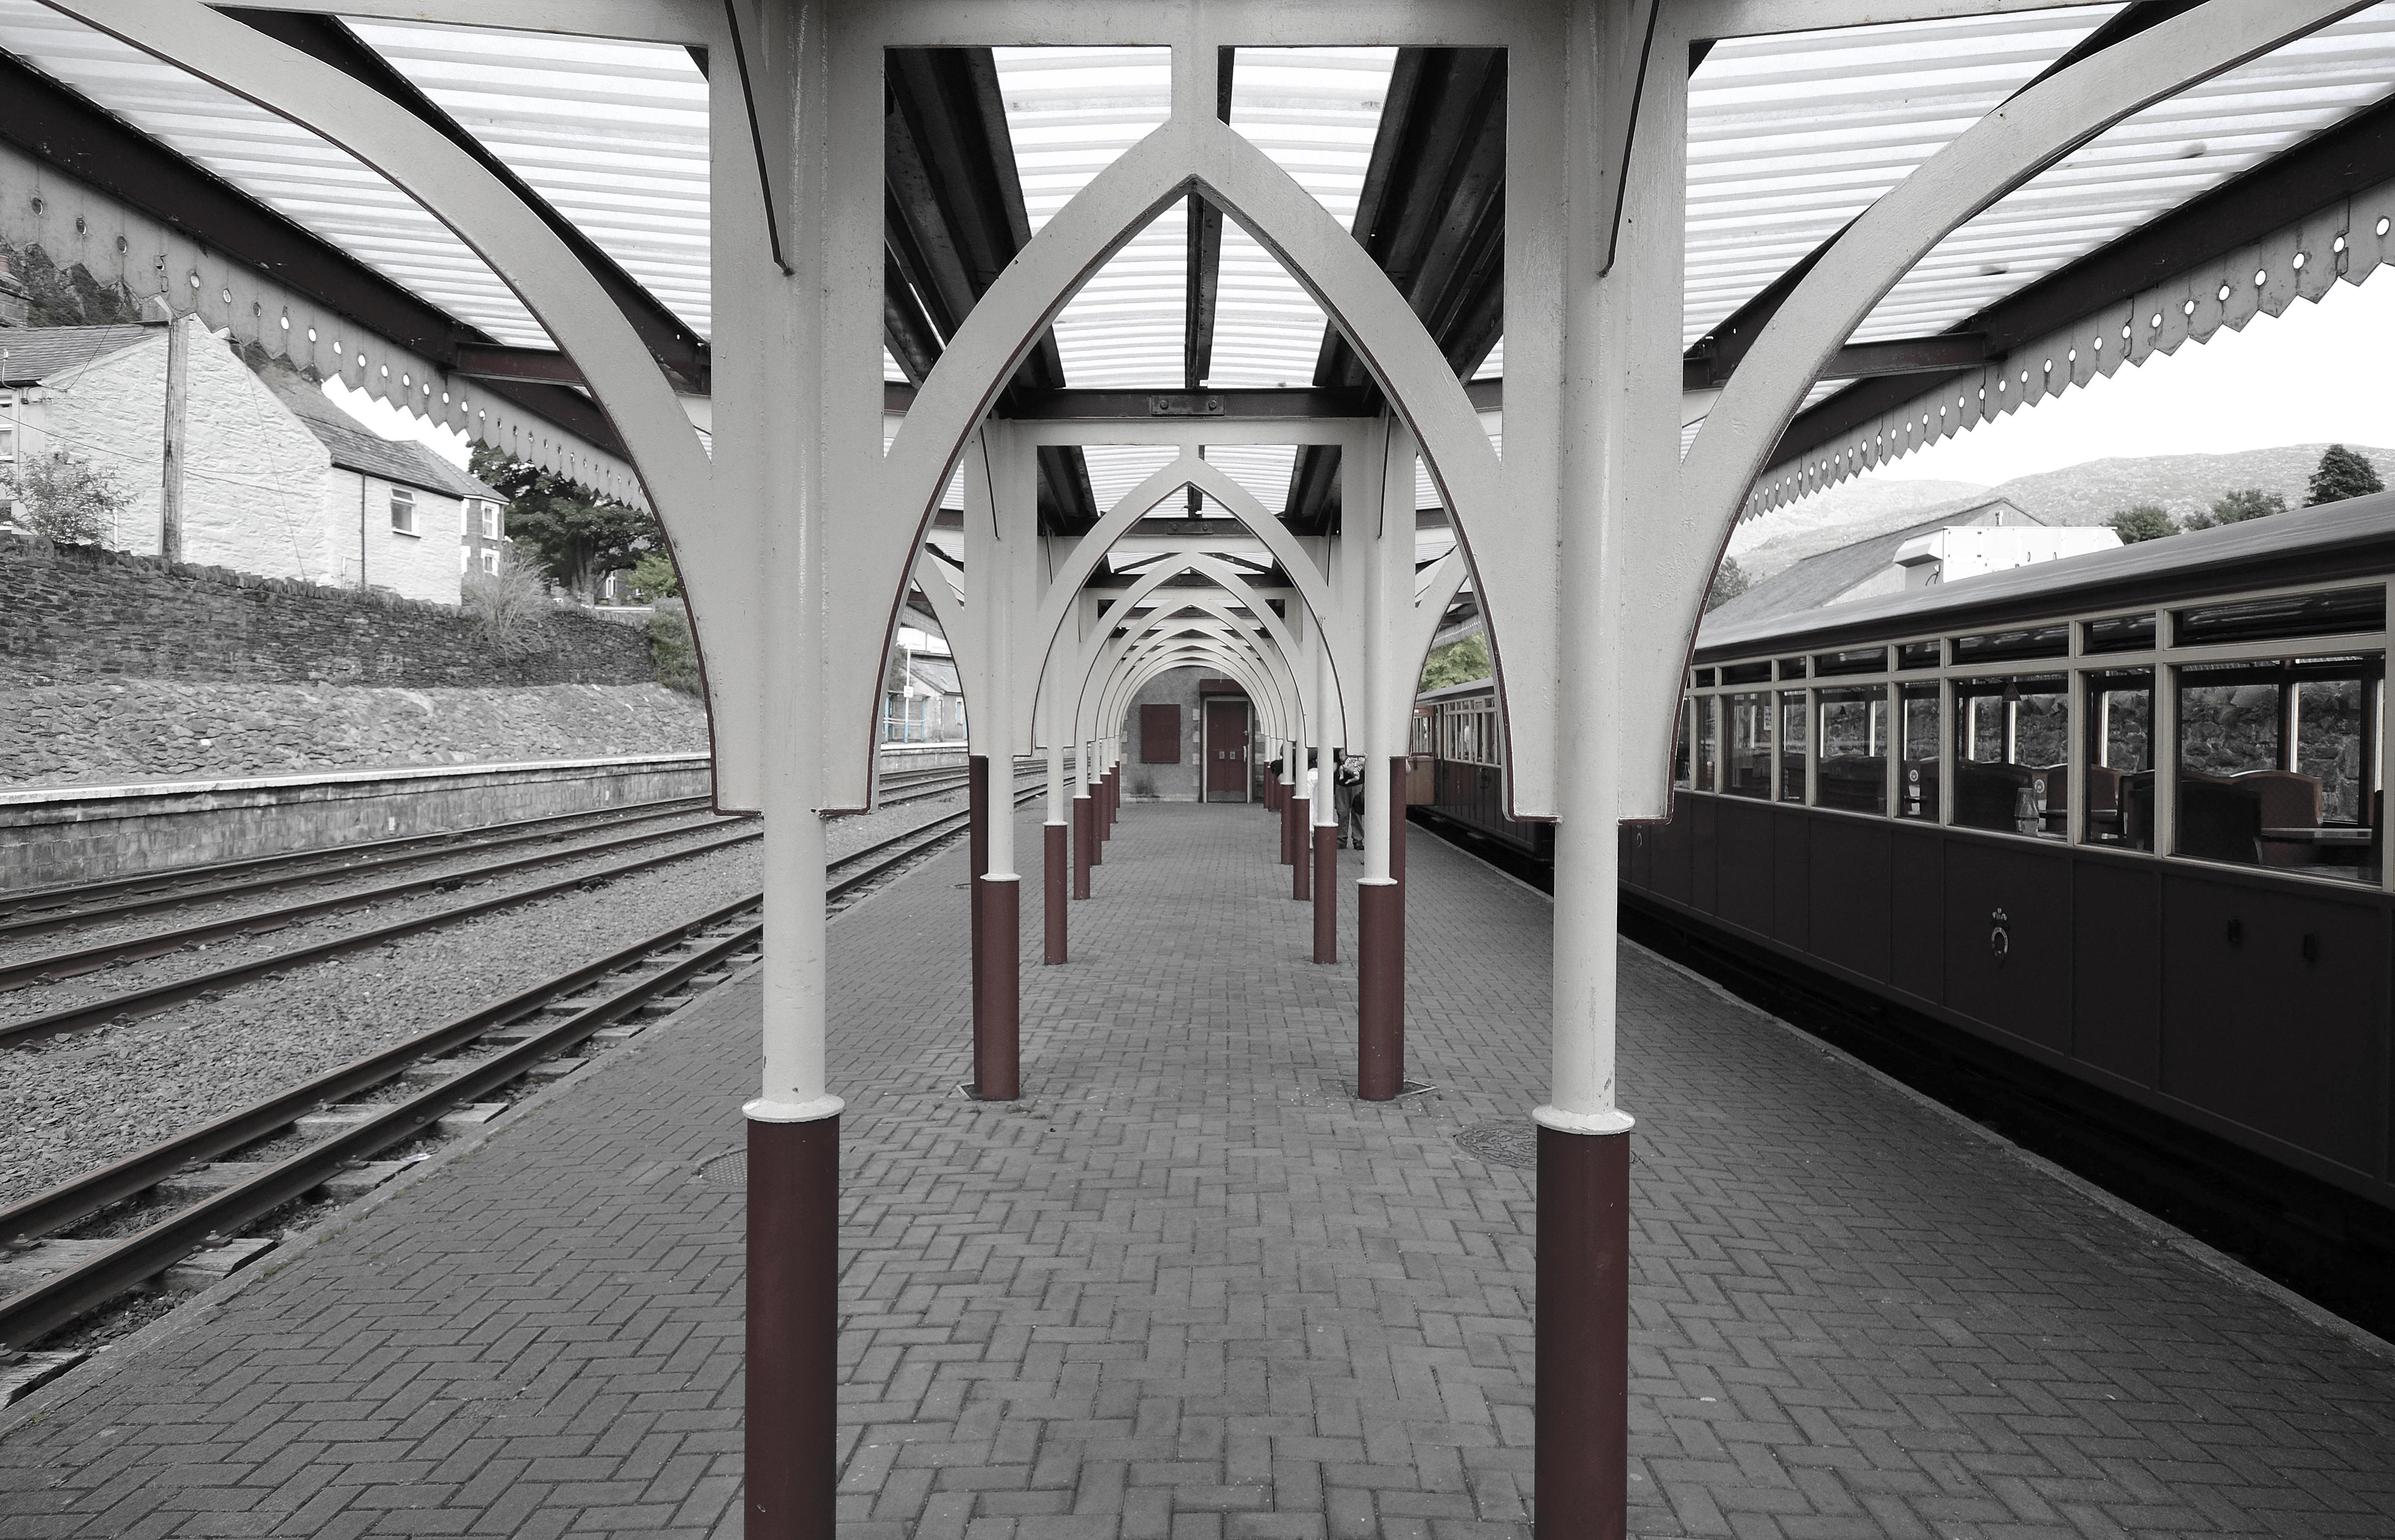 Architecture Track Railway Vintage Antique Retro Steam Rail Train Travel Subway Transportation Transport Vehicle Station